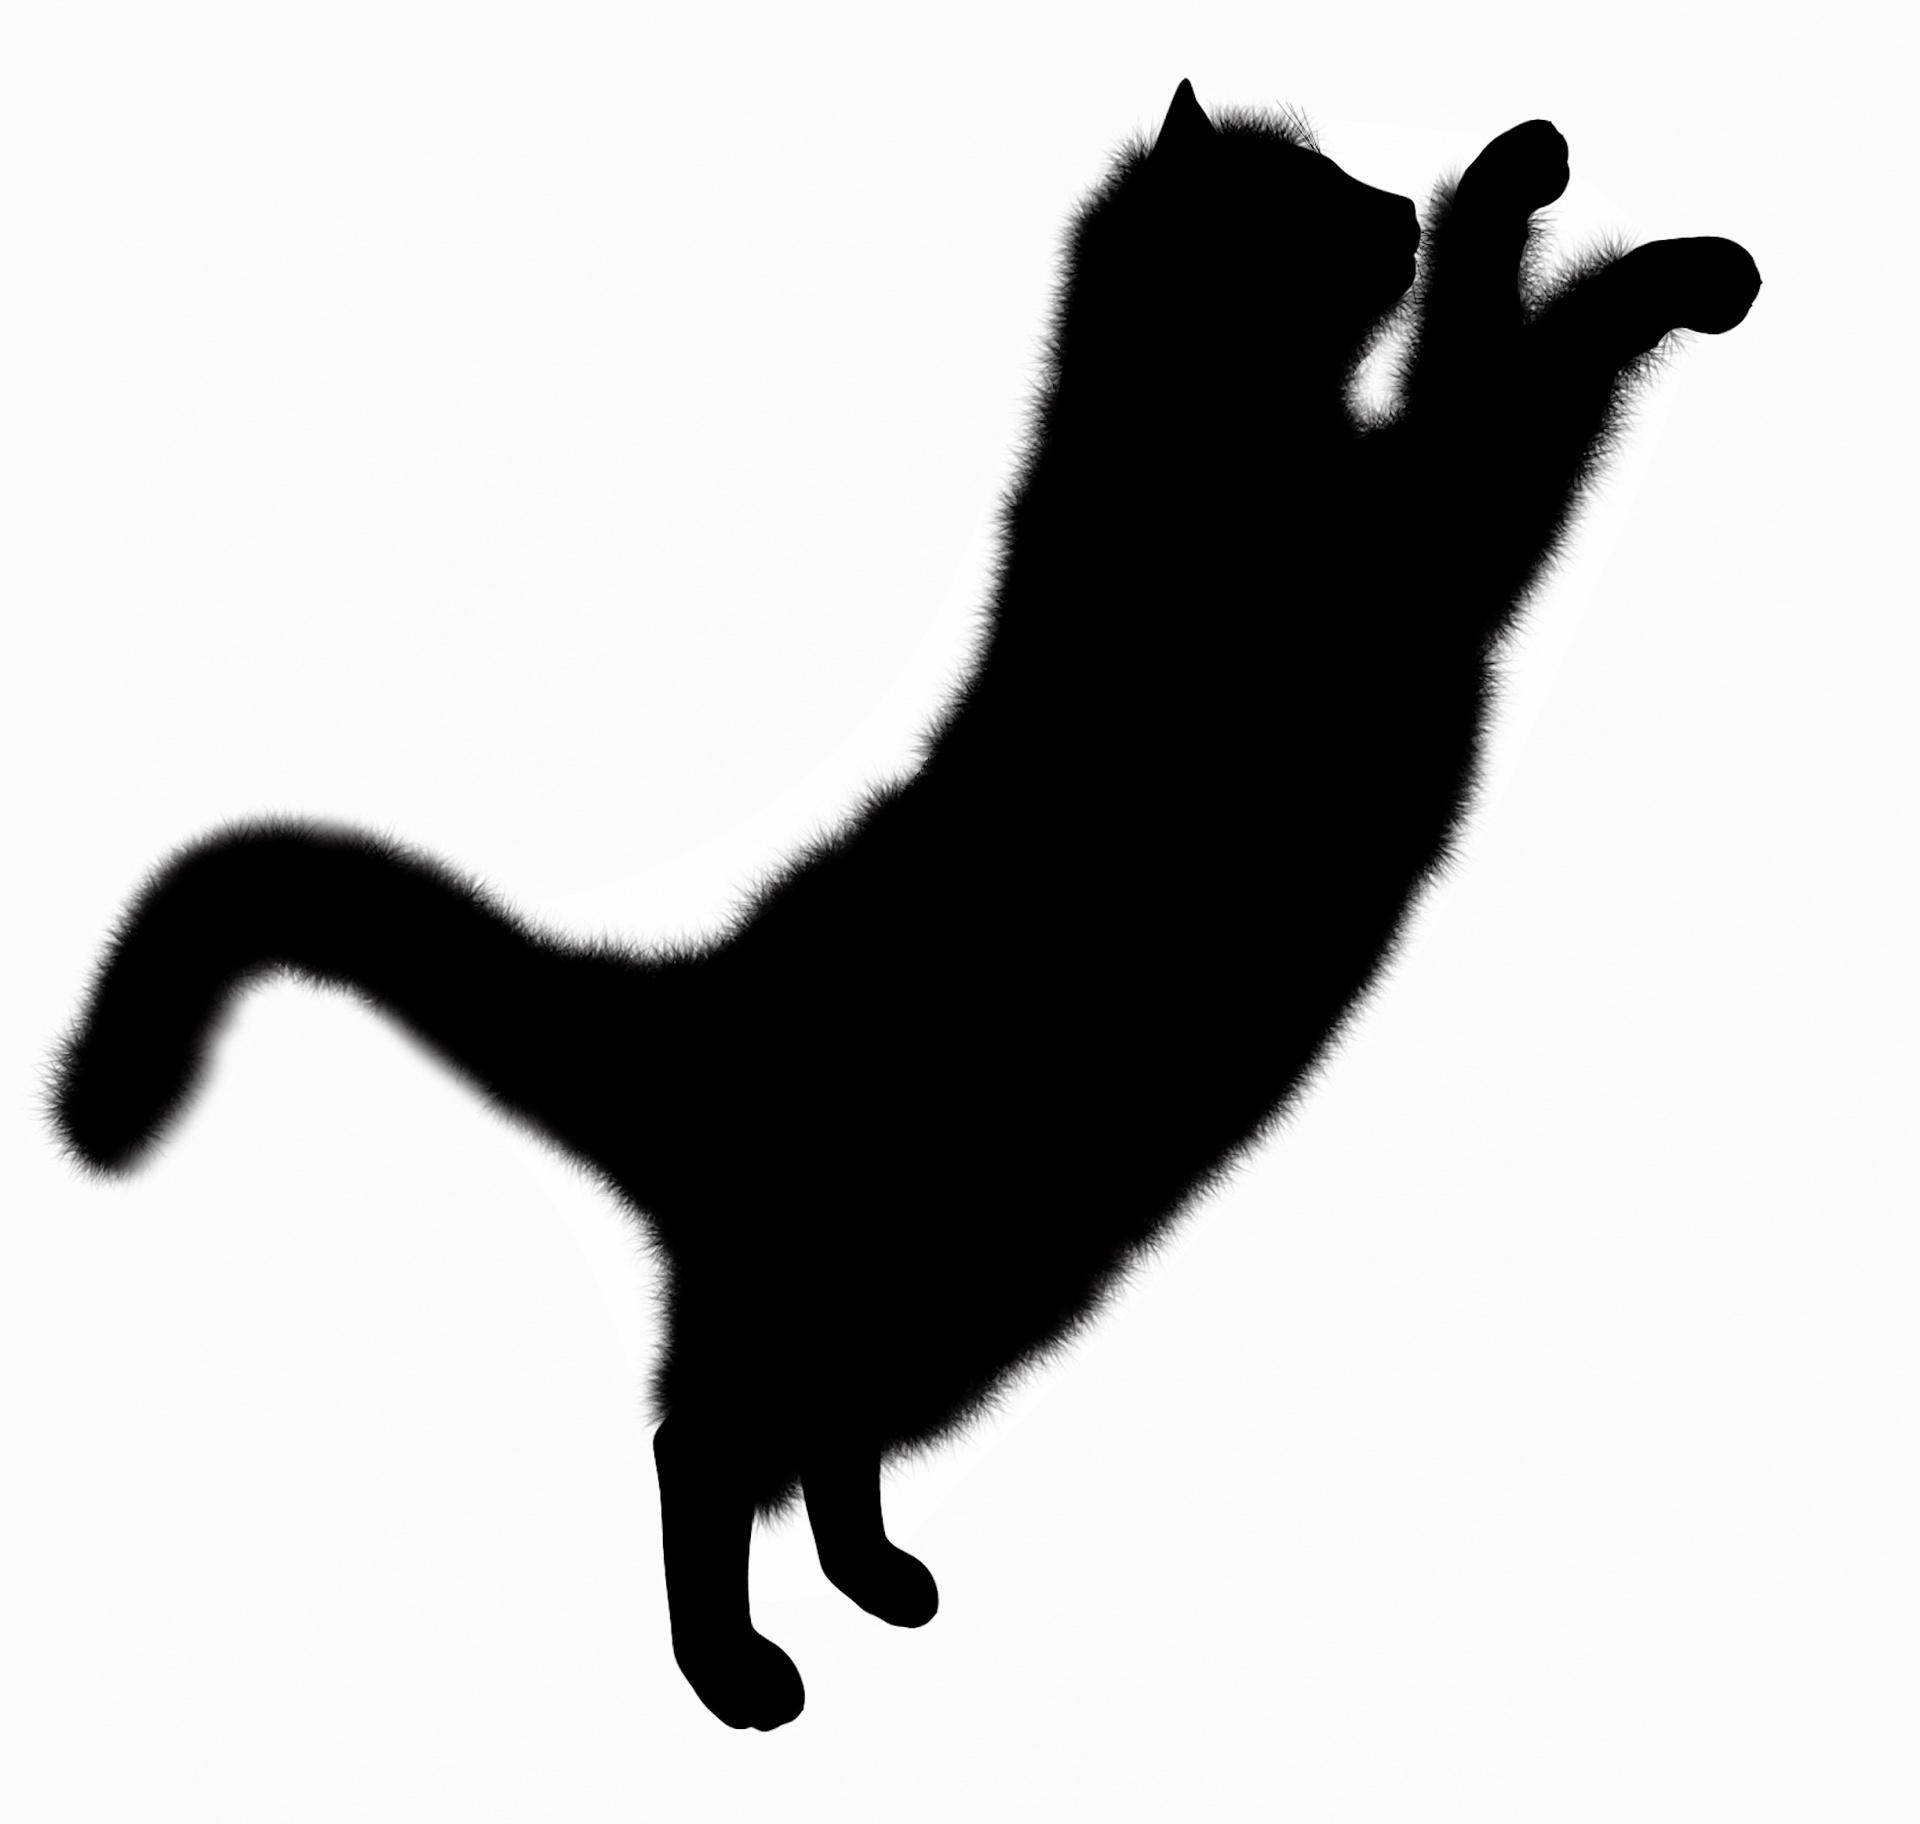 1920x1824 Silhouette Cat Free Stock Photo